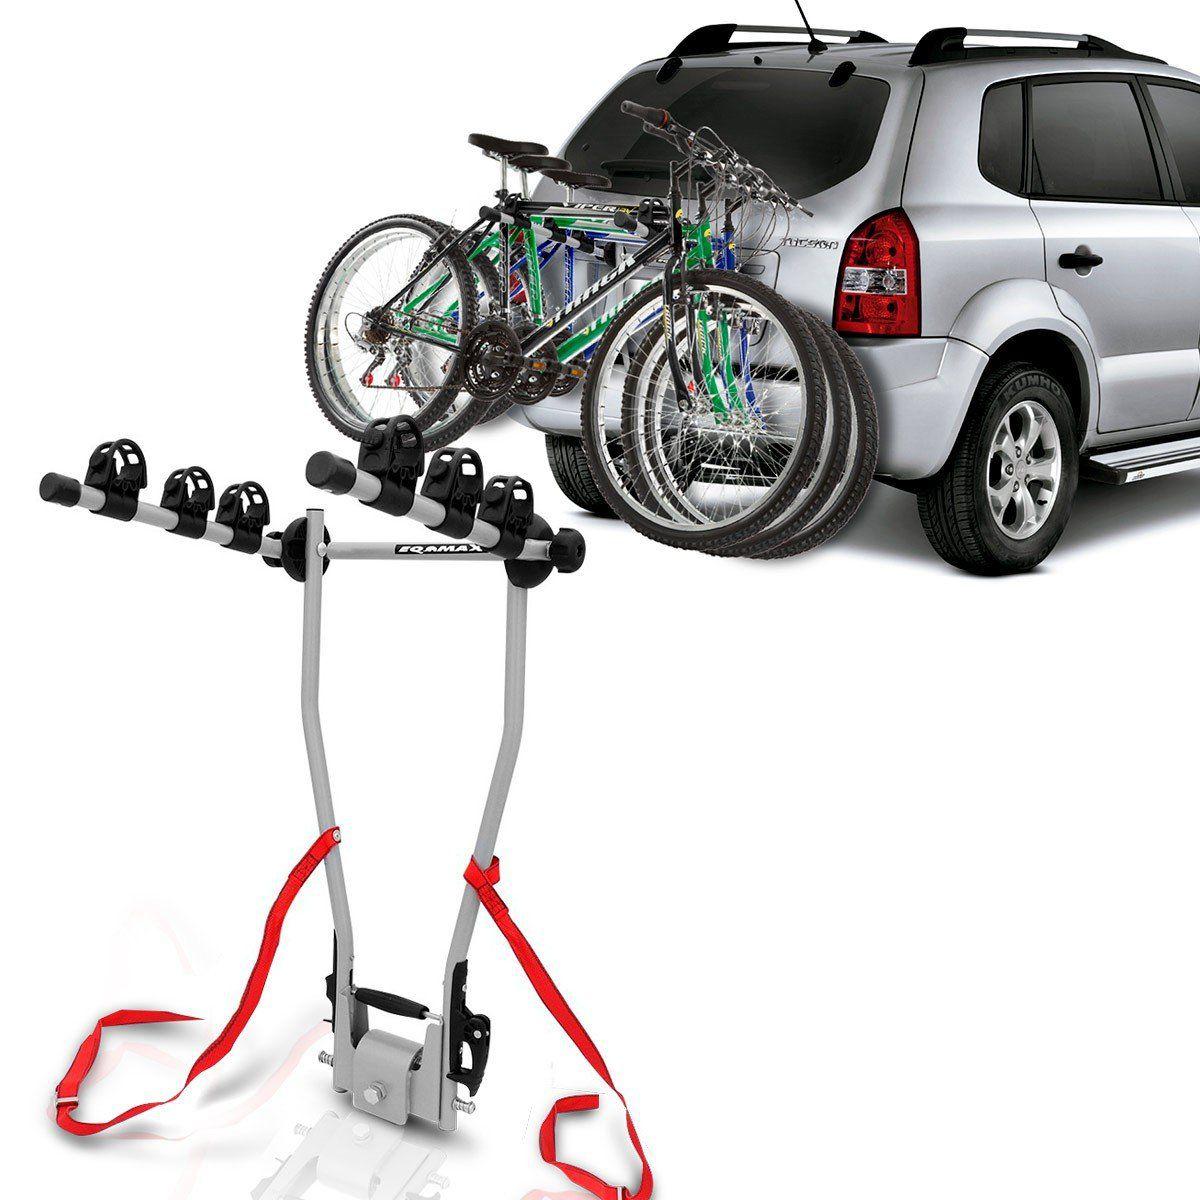 Suporte Transbike Porta Malas 3 Bikes Preto